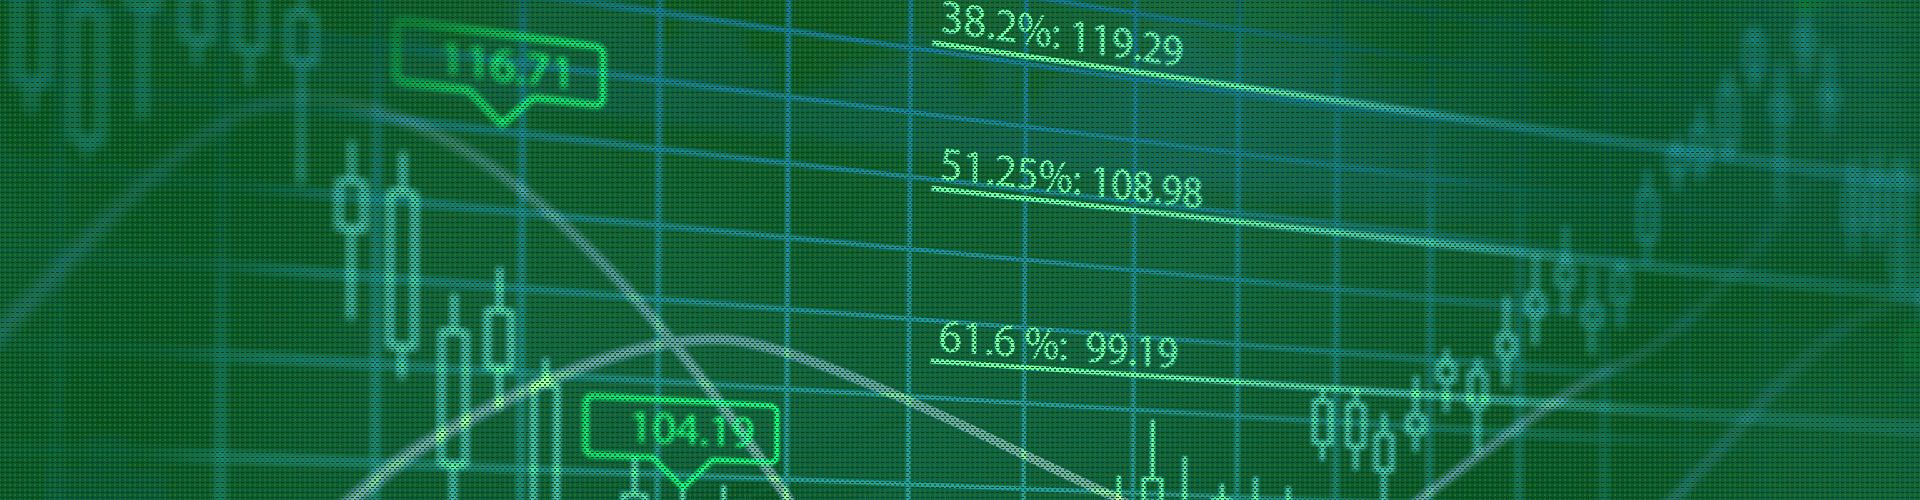 Option trade analysis